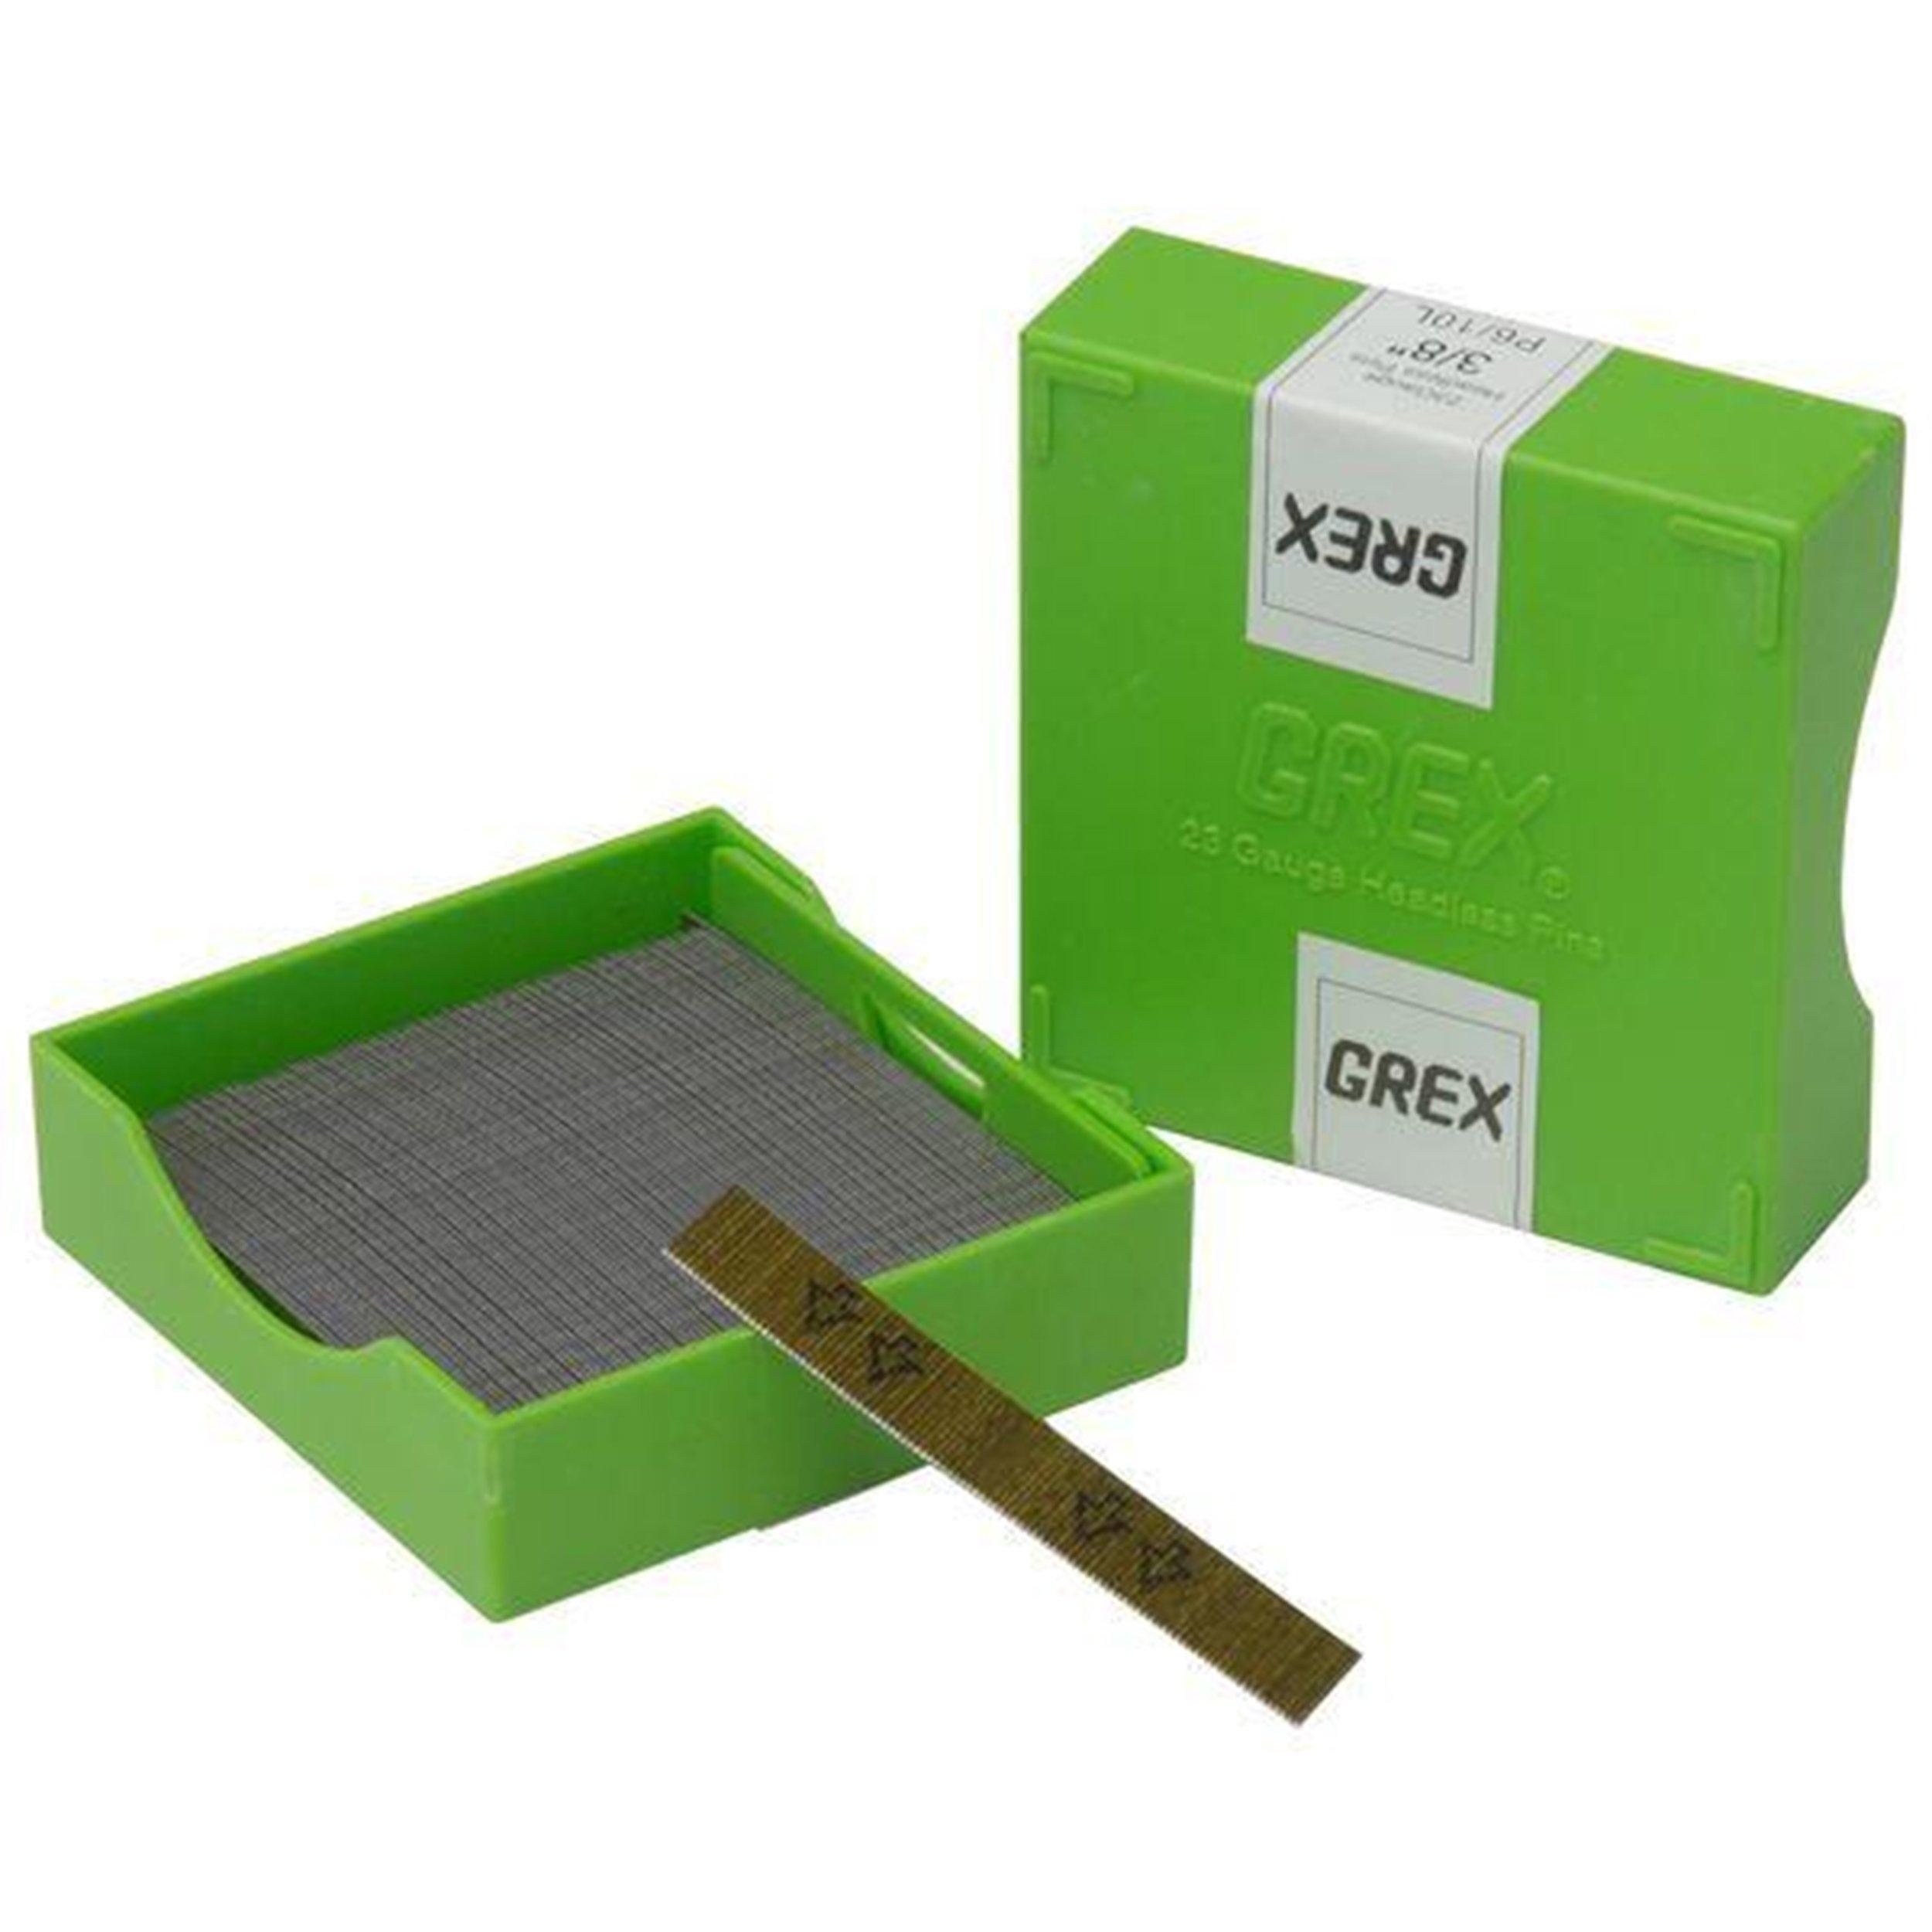 Grex 23 gauge 1 3/16 inch Headless Pins 10K Box